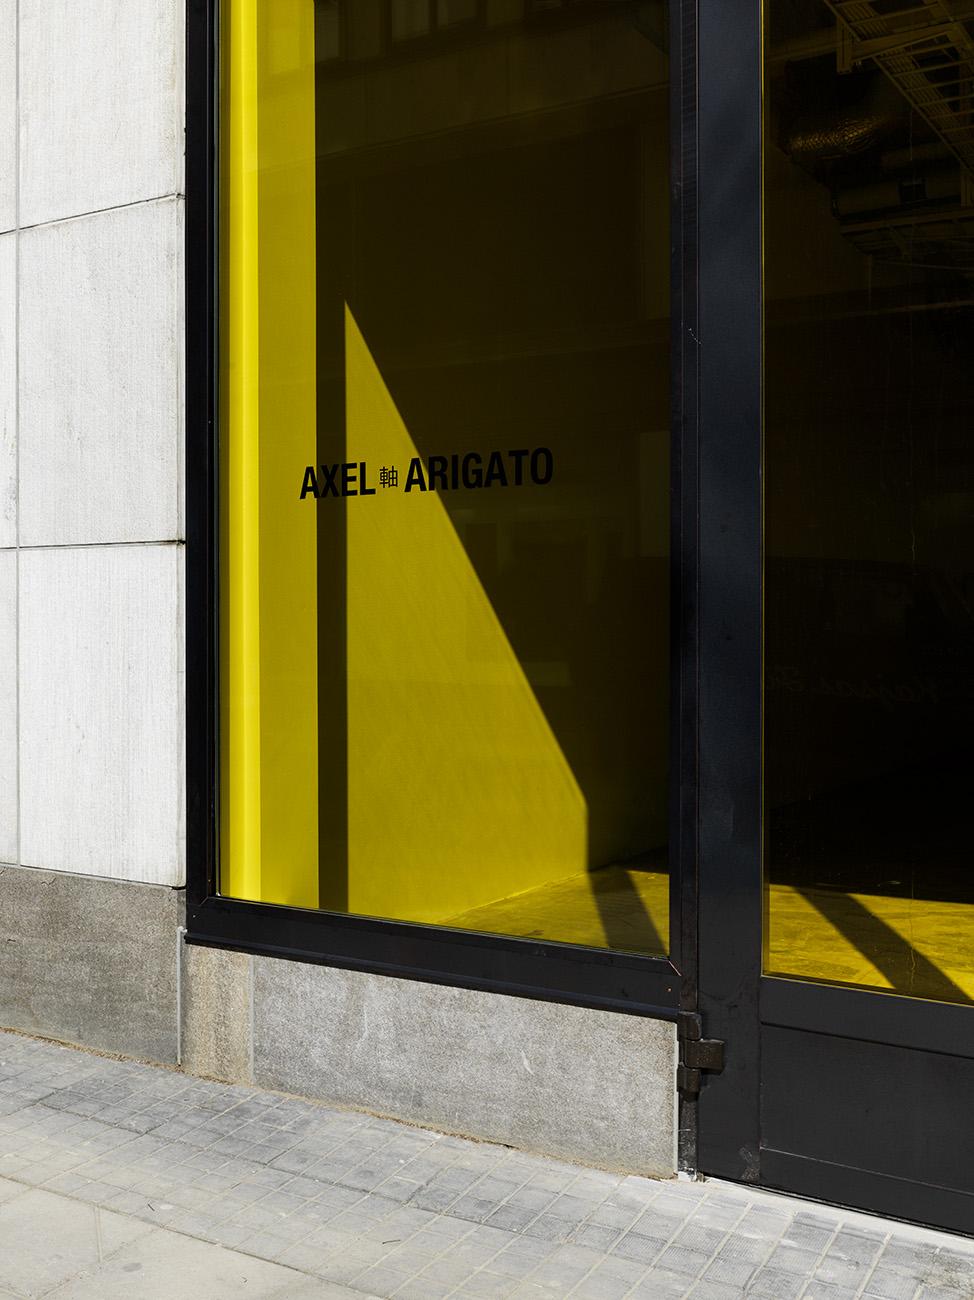 Axel Arigato / Christian Halleröd Design